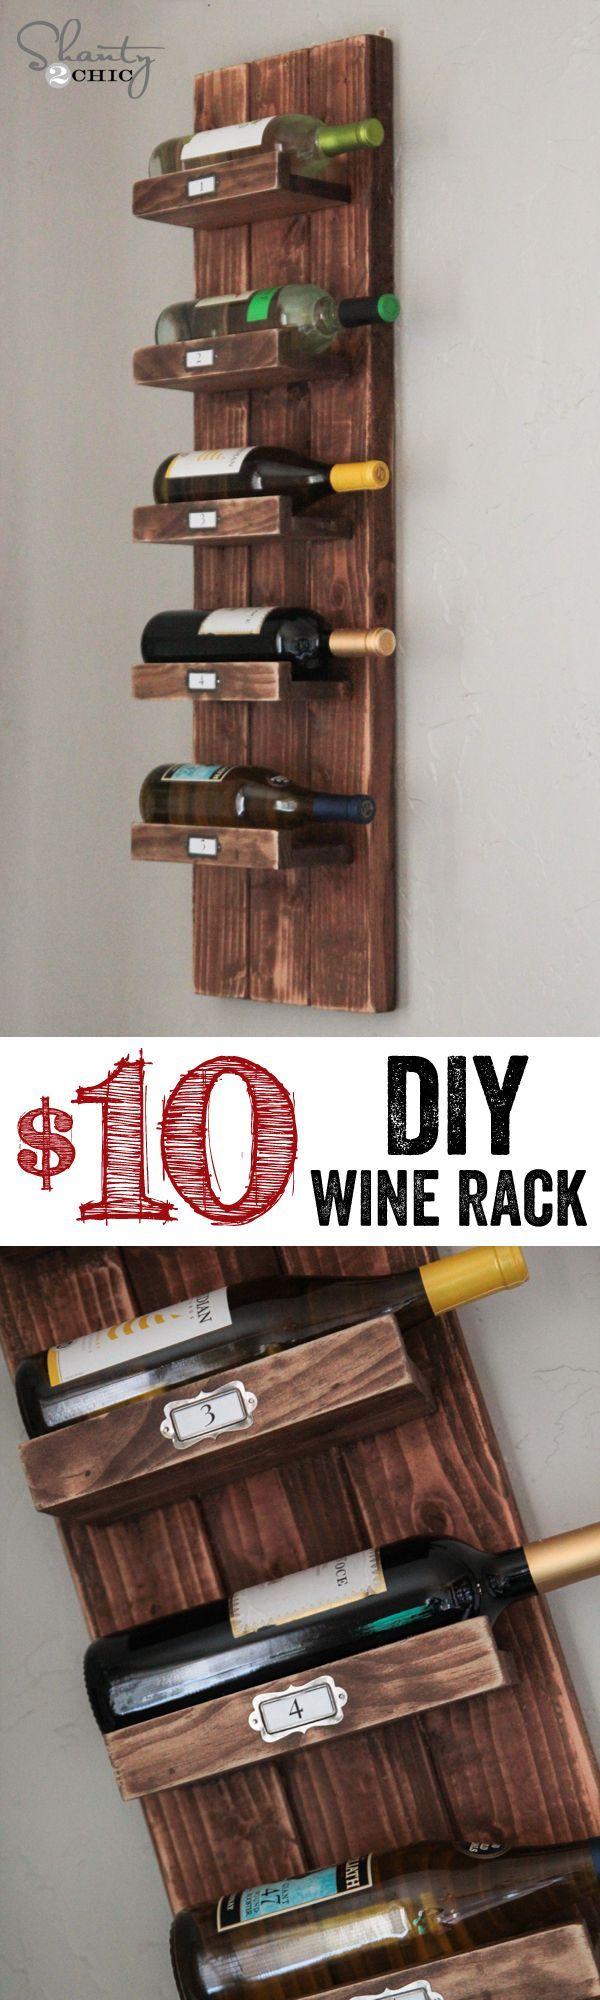 DIY Wine Rack… LOVE this!  So cheap too!  www.shanty-2-chic.com #WineIdeas